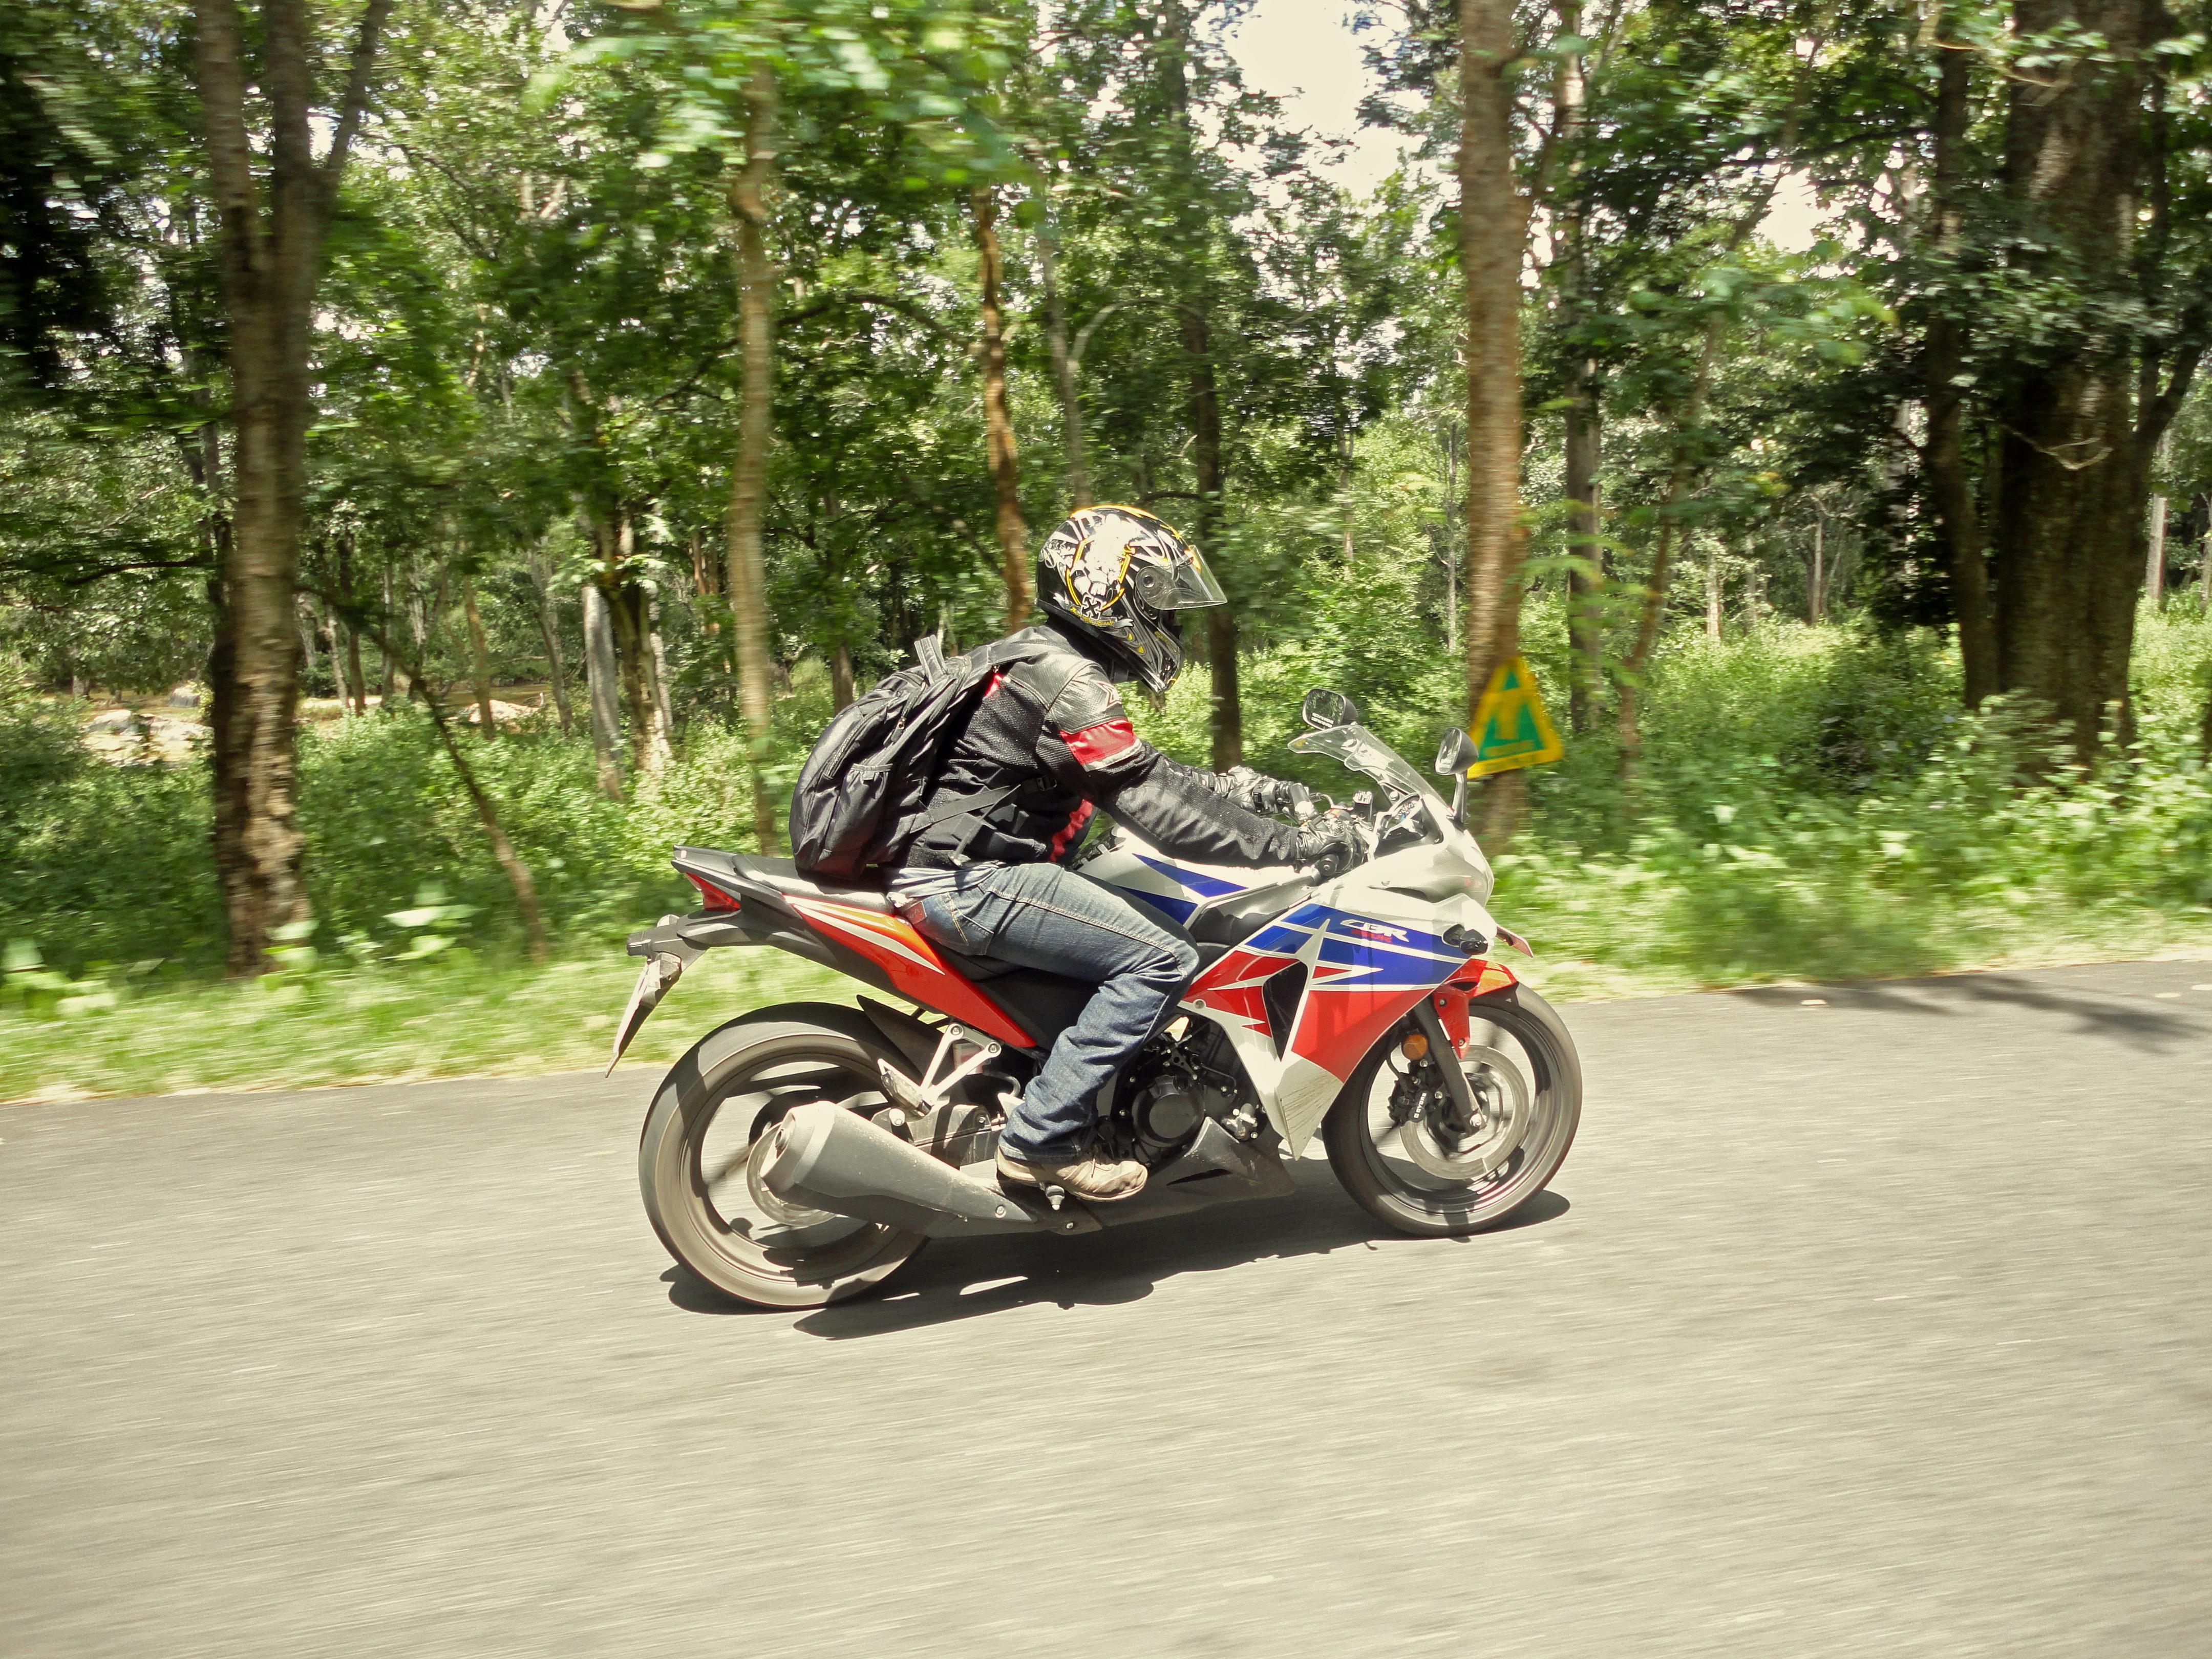 Honda Cbr250r 2013 9000kms Ownership Review Wheelsnshields Hand Guard New Cbr 250rr Dsc00239